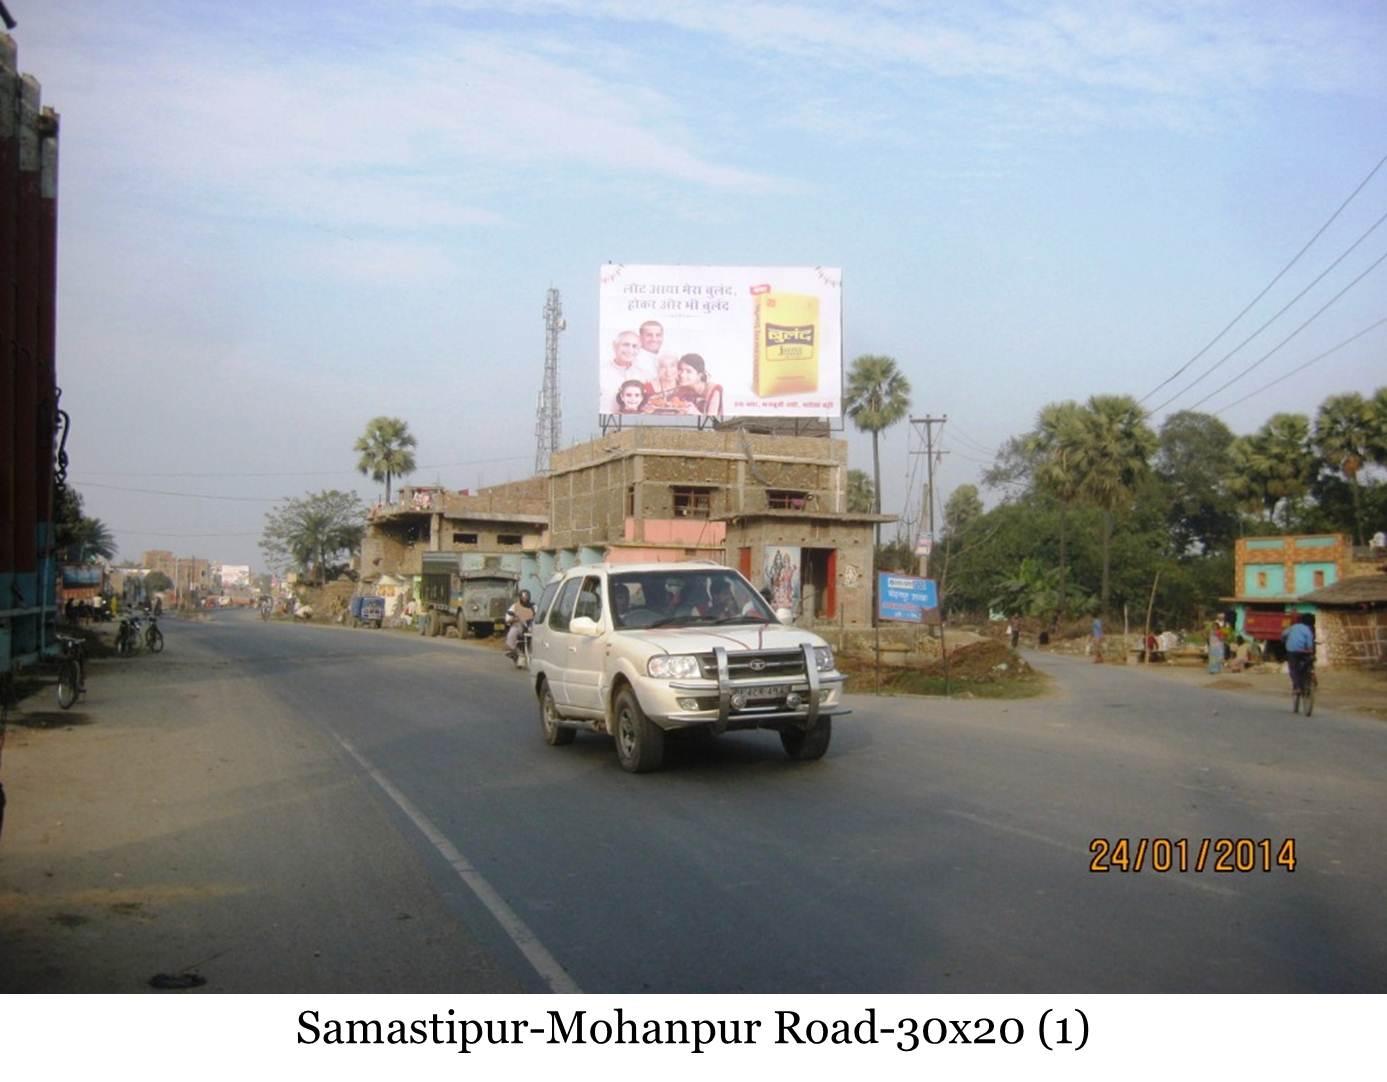 Mohanpur Rd, Samastipur